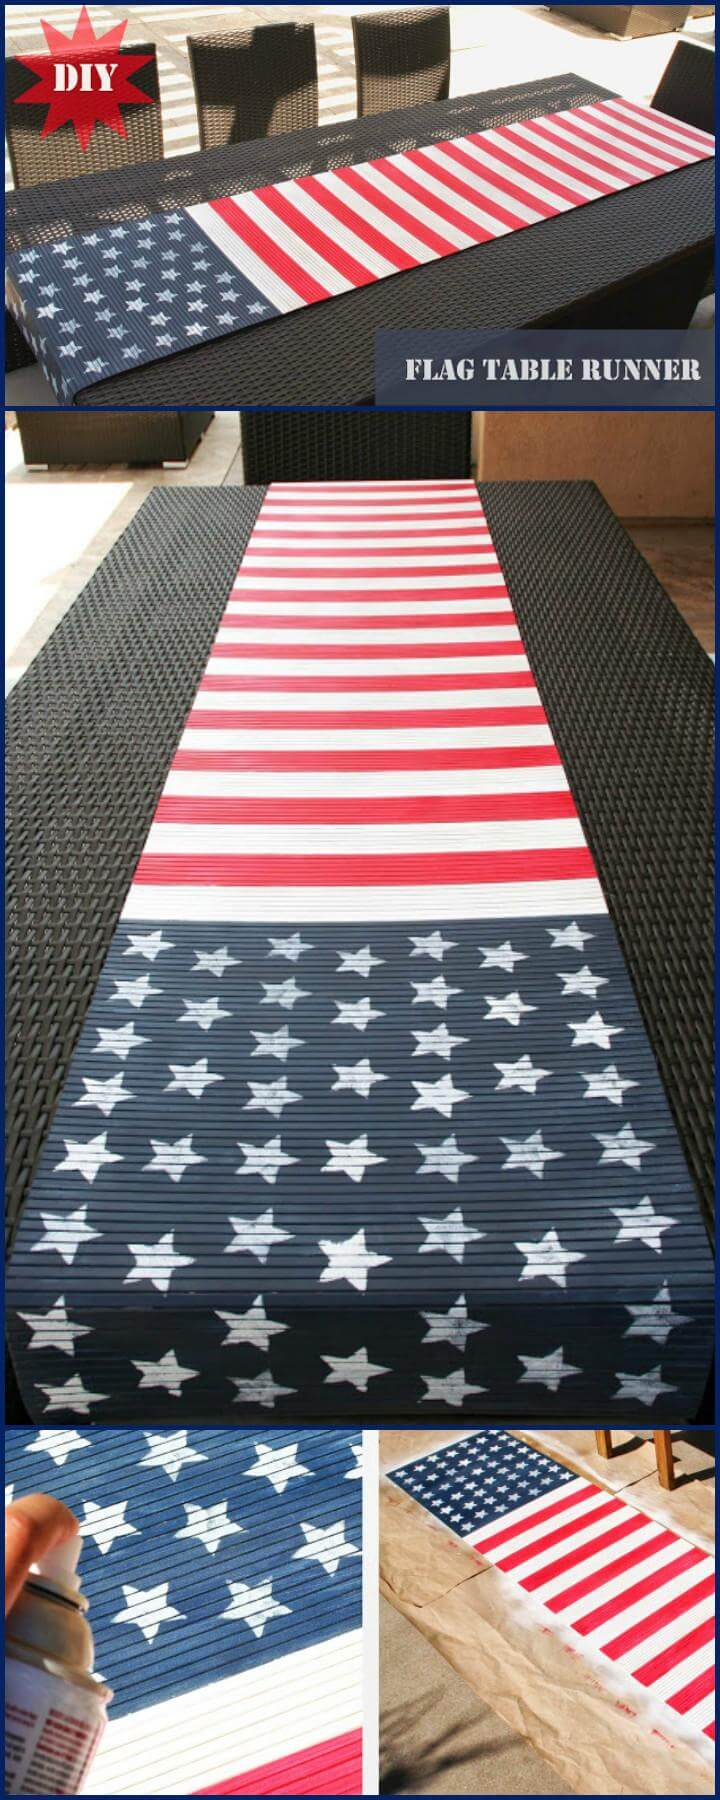 29 DIY American Flag Table Runner